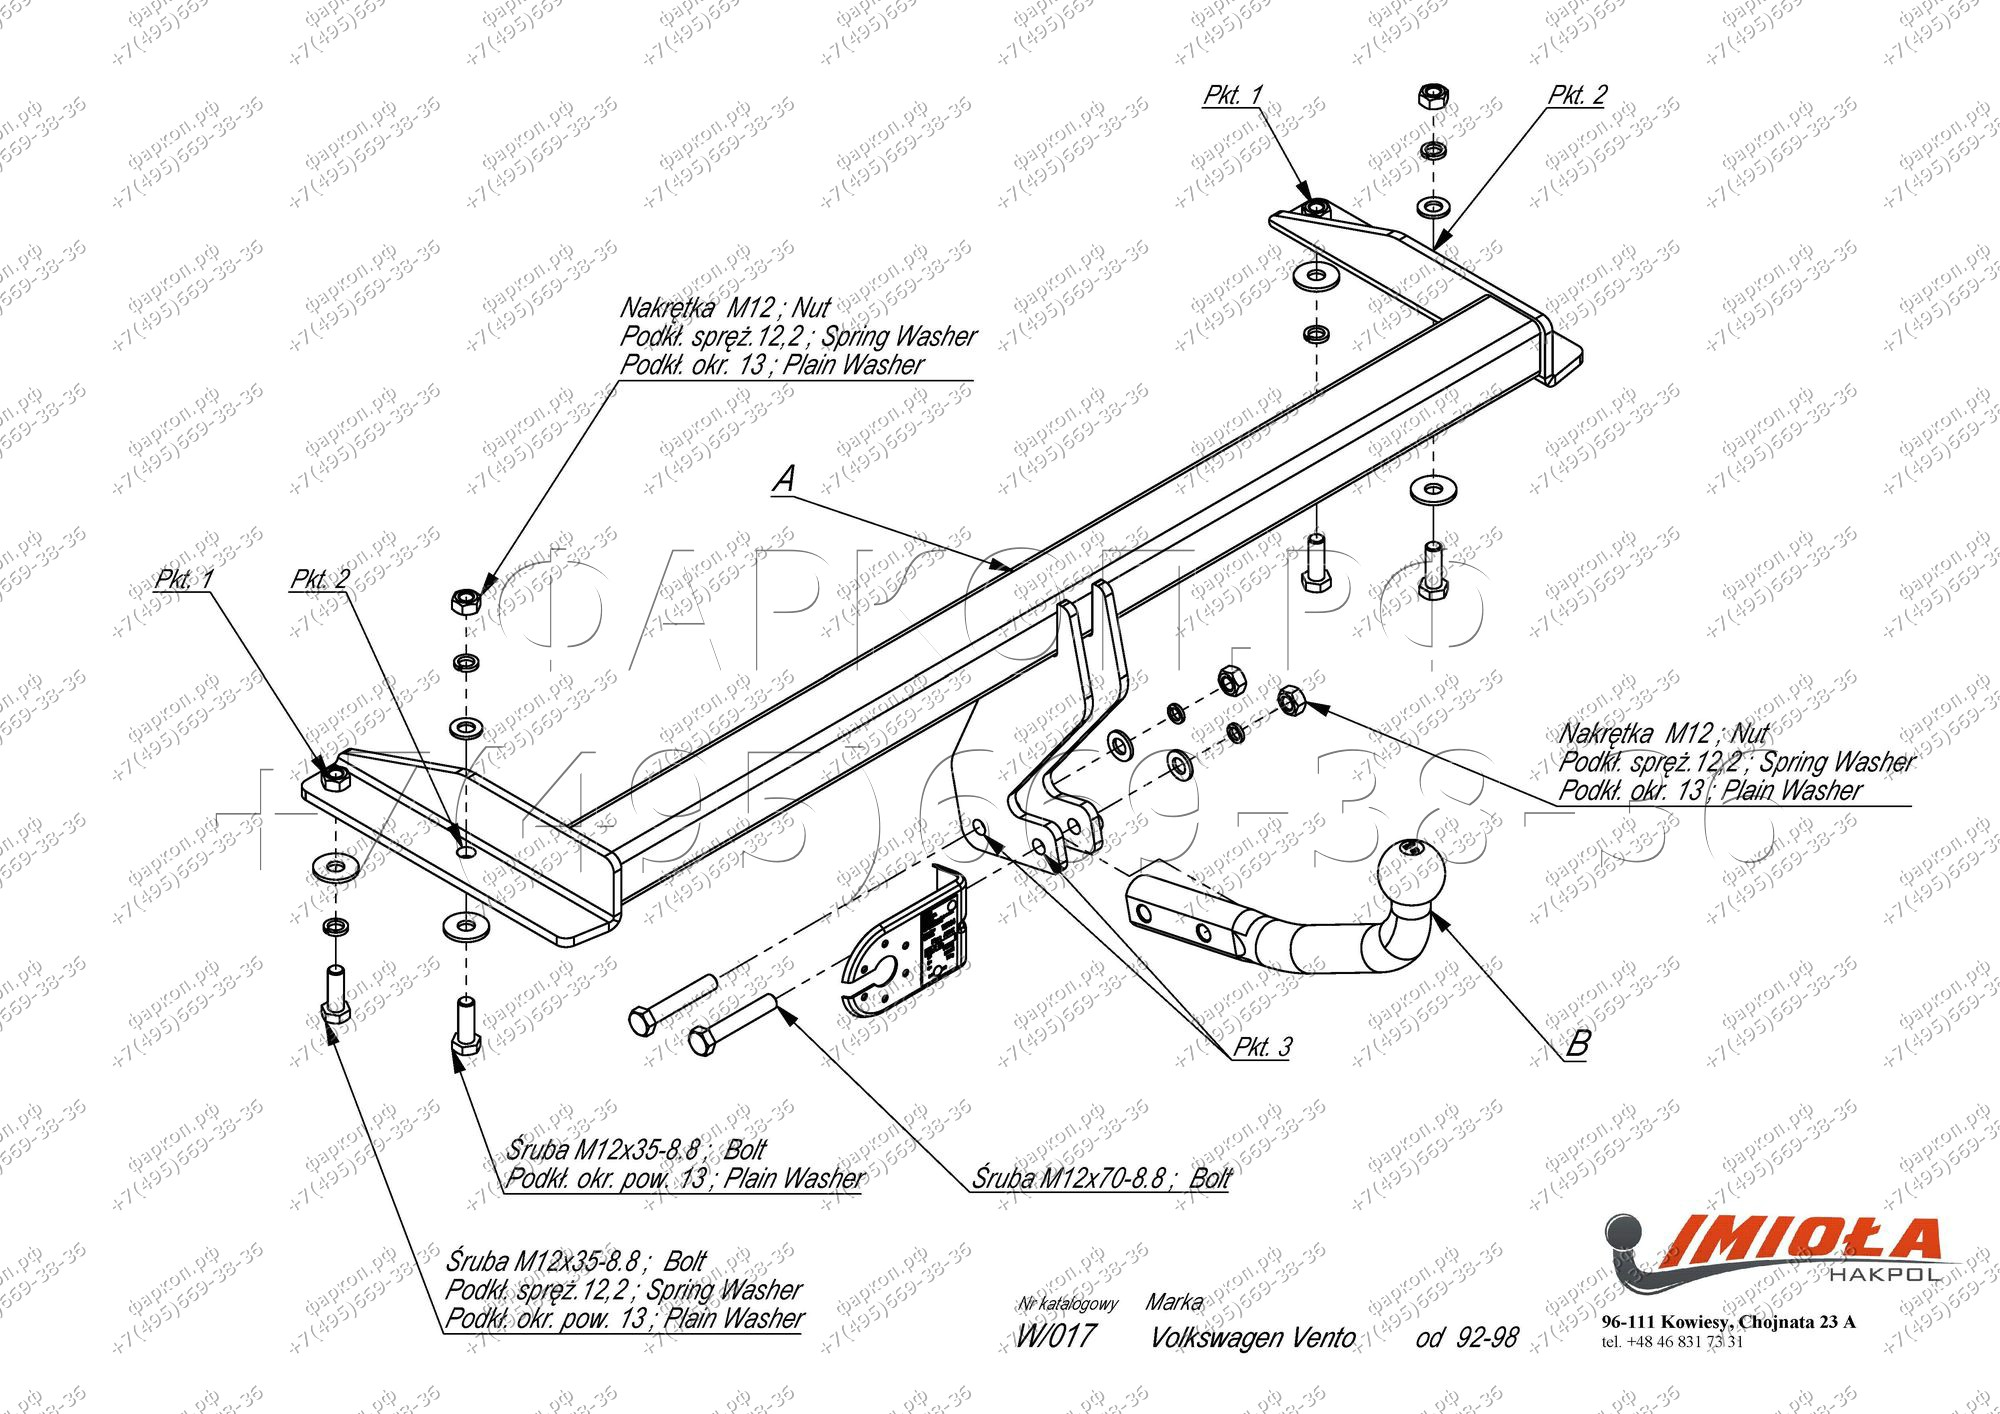 Фаркоп Volkswagen Vento 92-98 Тип шара: A необходима подрезка бампера.  Нагрузки: 1600/75 кг (электрика в комплекте) .